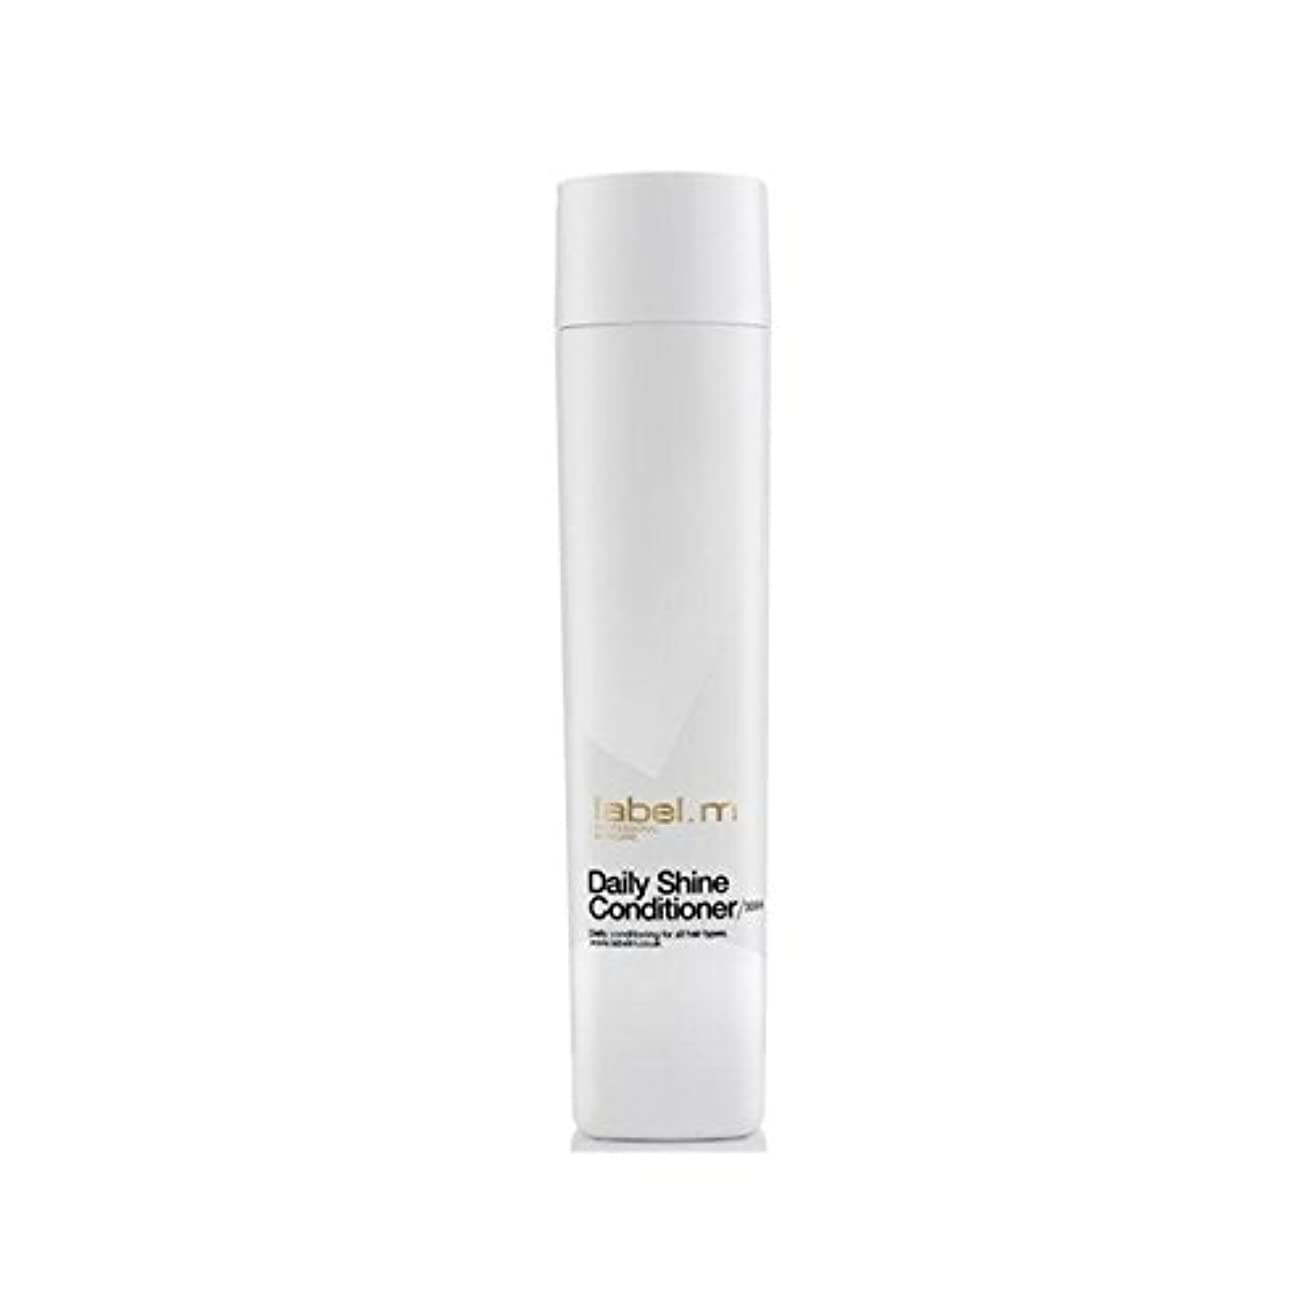 Label.M Daily Shine Conditioner (300ml) (Pack of 6) - .毎日シャインコンディショナー(300ミリリットル) x6 [並行輸入品]